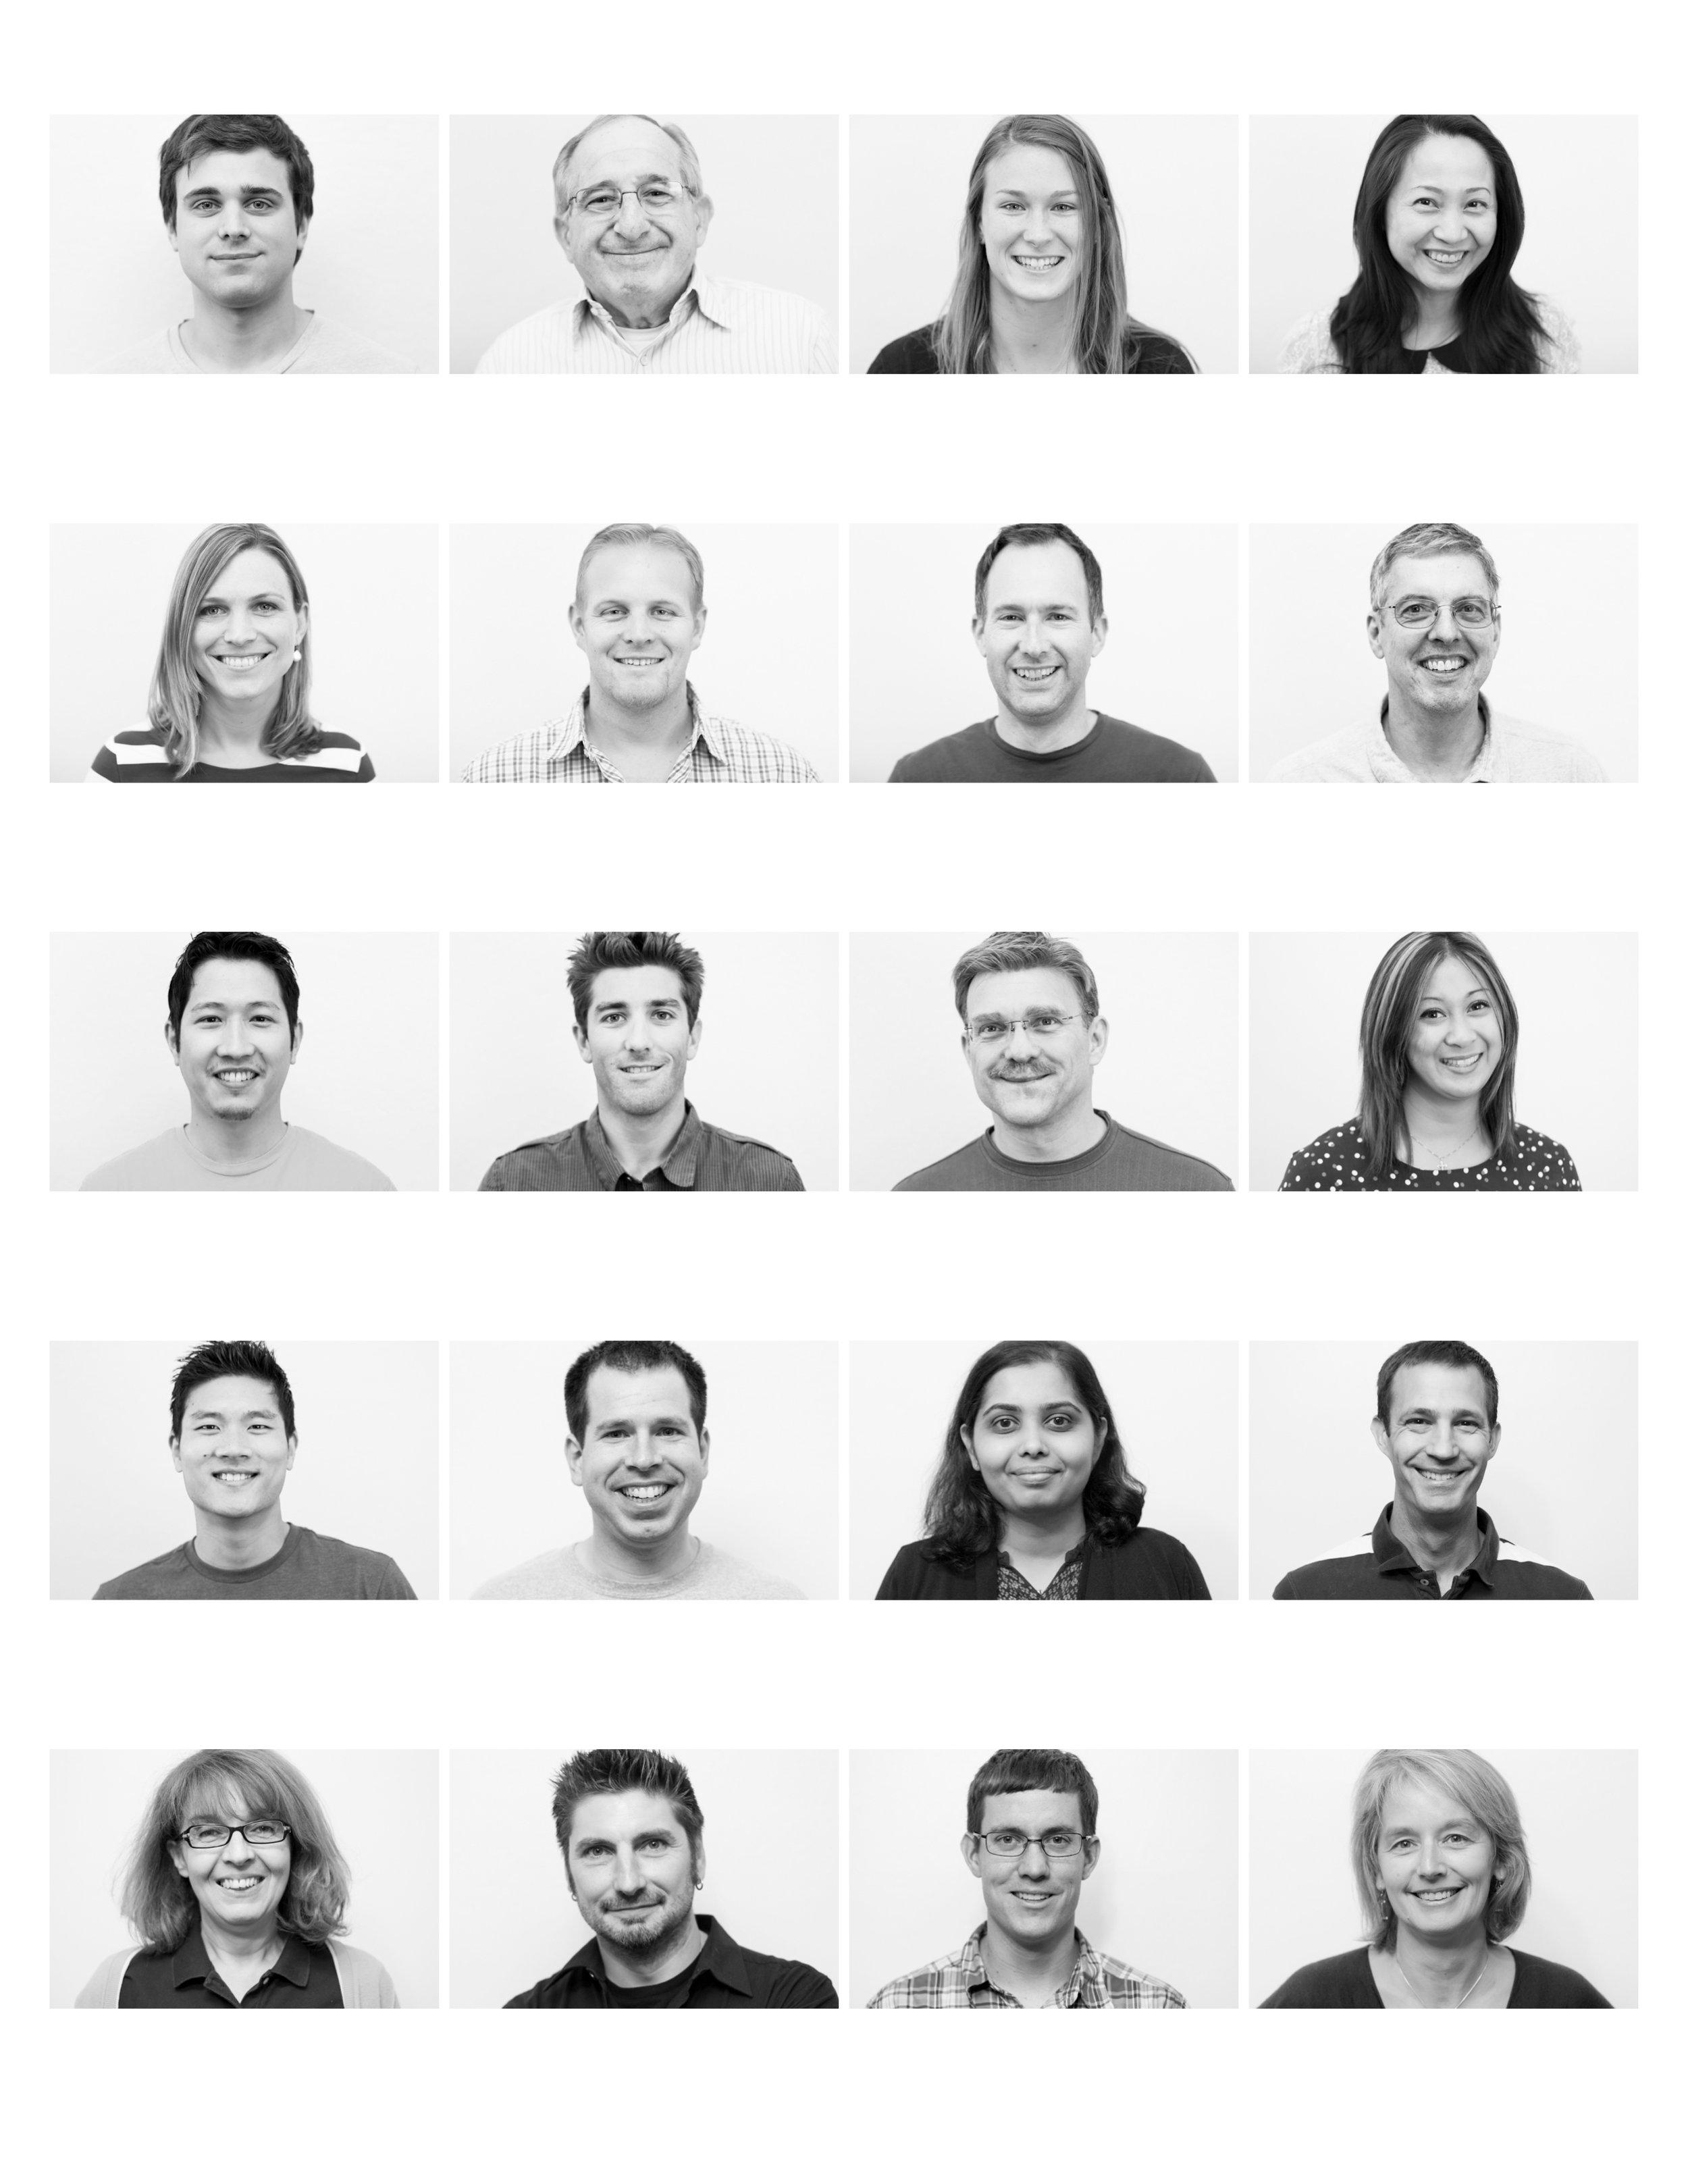 Copy of professional-photography-matt-mcdonald-office-culture-startup-63mph